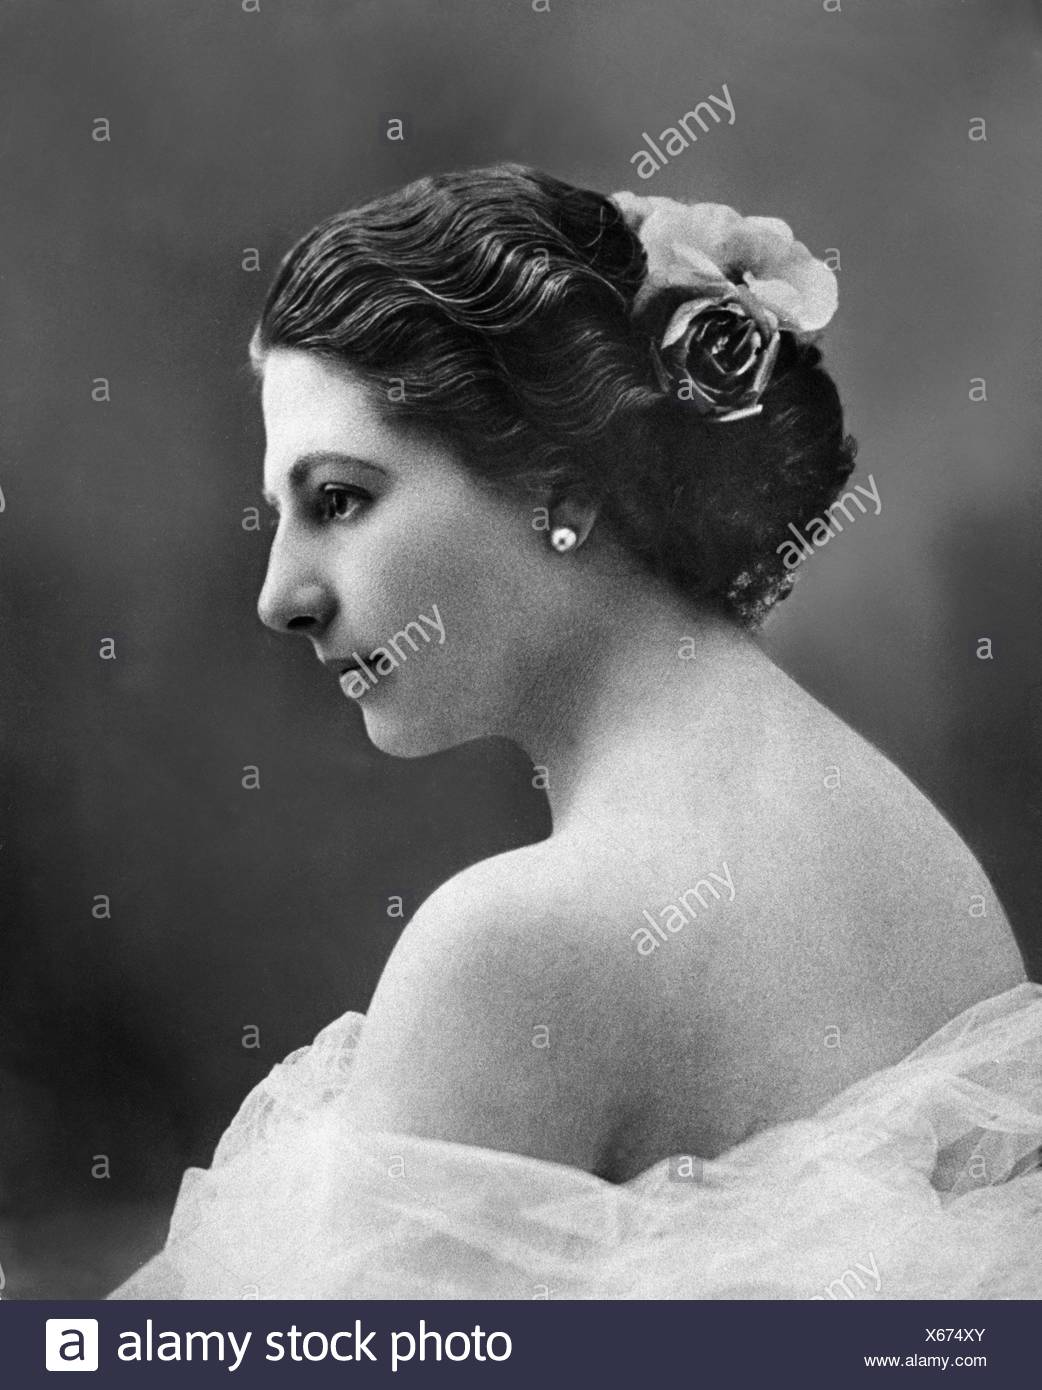 Mata Hari, 7.8.1876 - 15.10.1917, Dutch dancer and spy, portrait, circa 1905, Additional-Rights-Clearances-NA - Stock Image